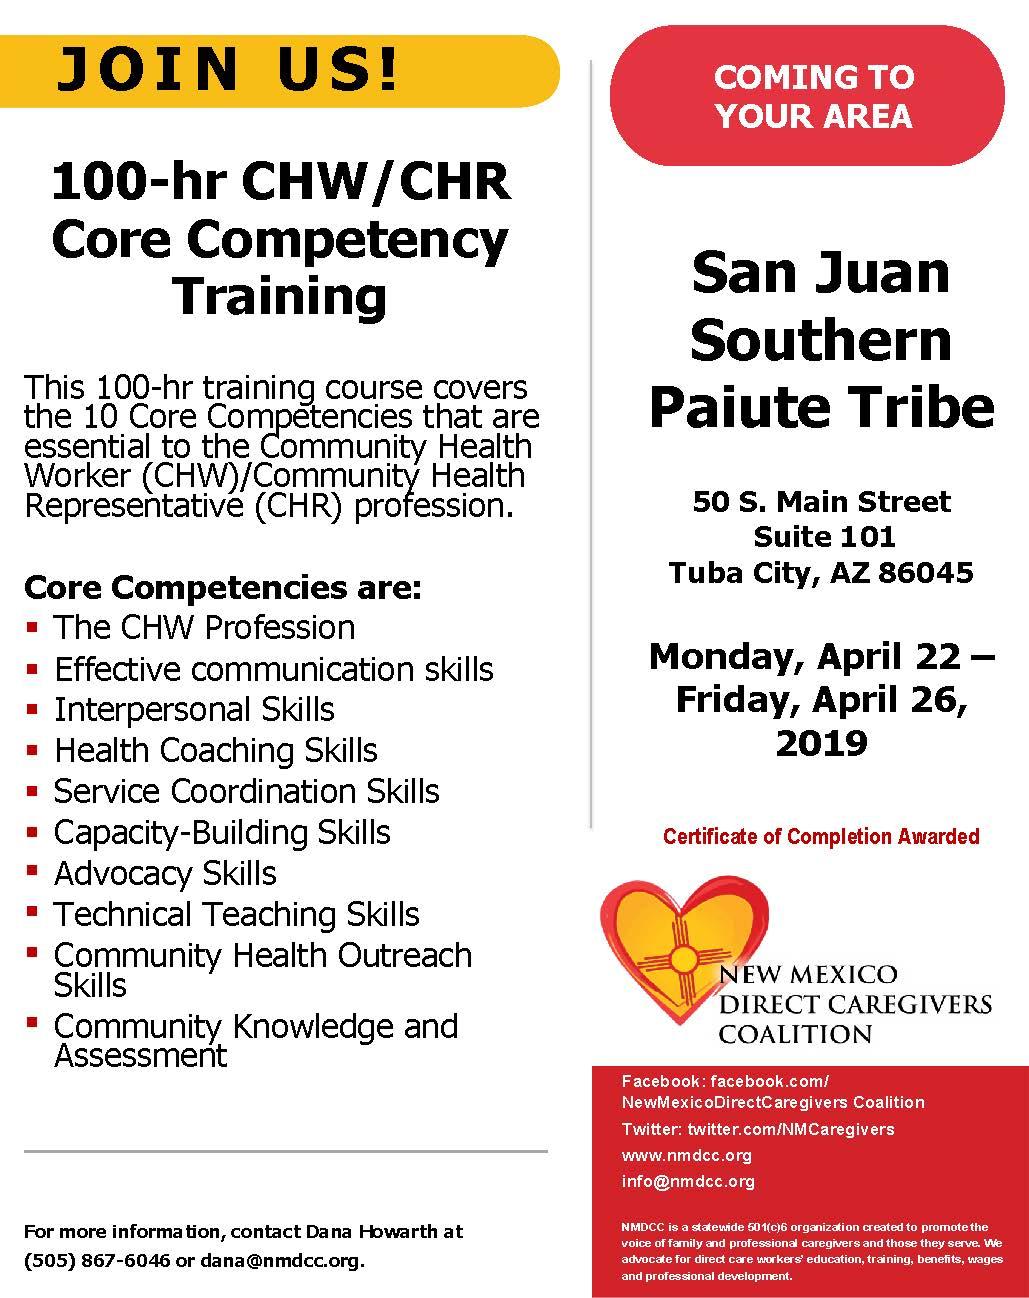 100-hr CHW/CHR Core Competency Training | San Juan Southern